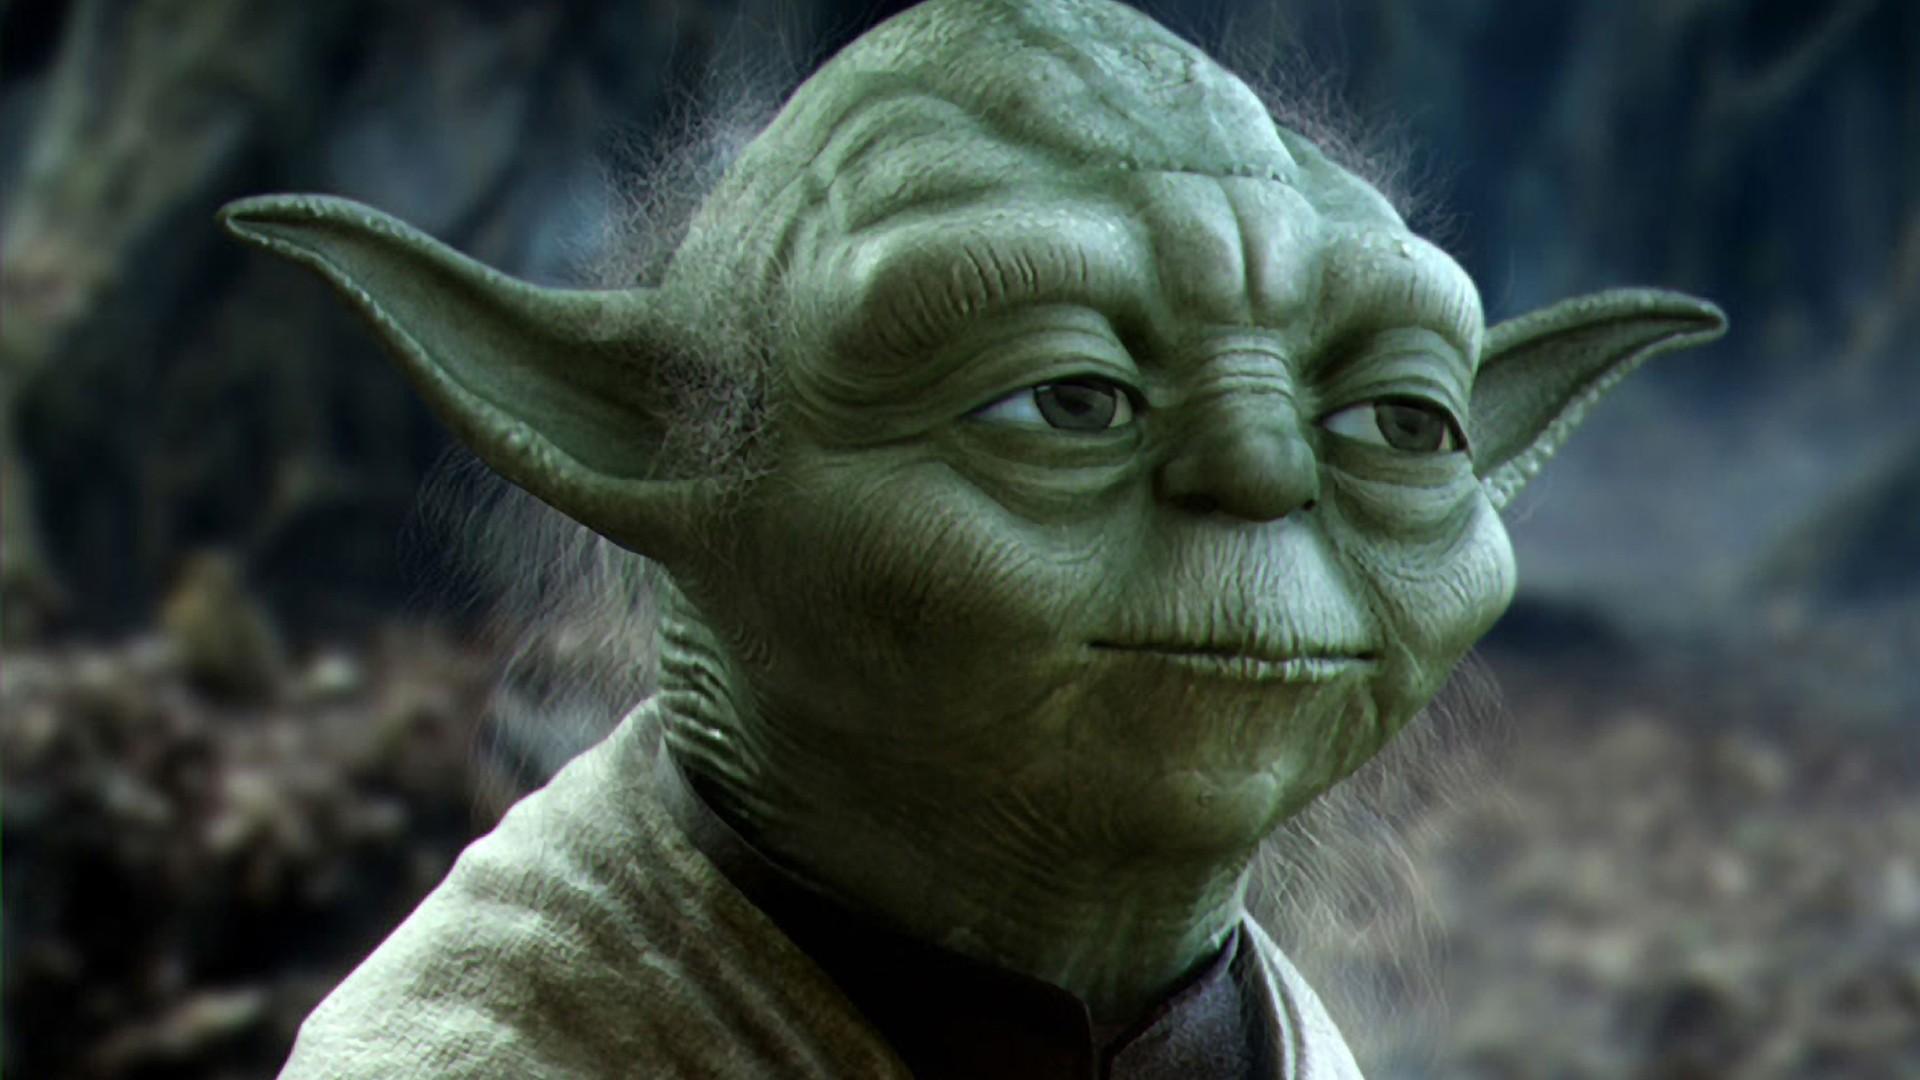 Star Wars Personalized Yoda Birthday Message Wordpress Slideshow